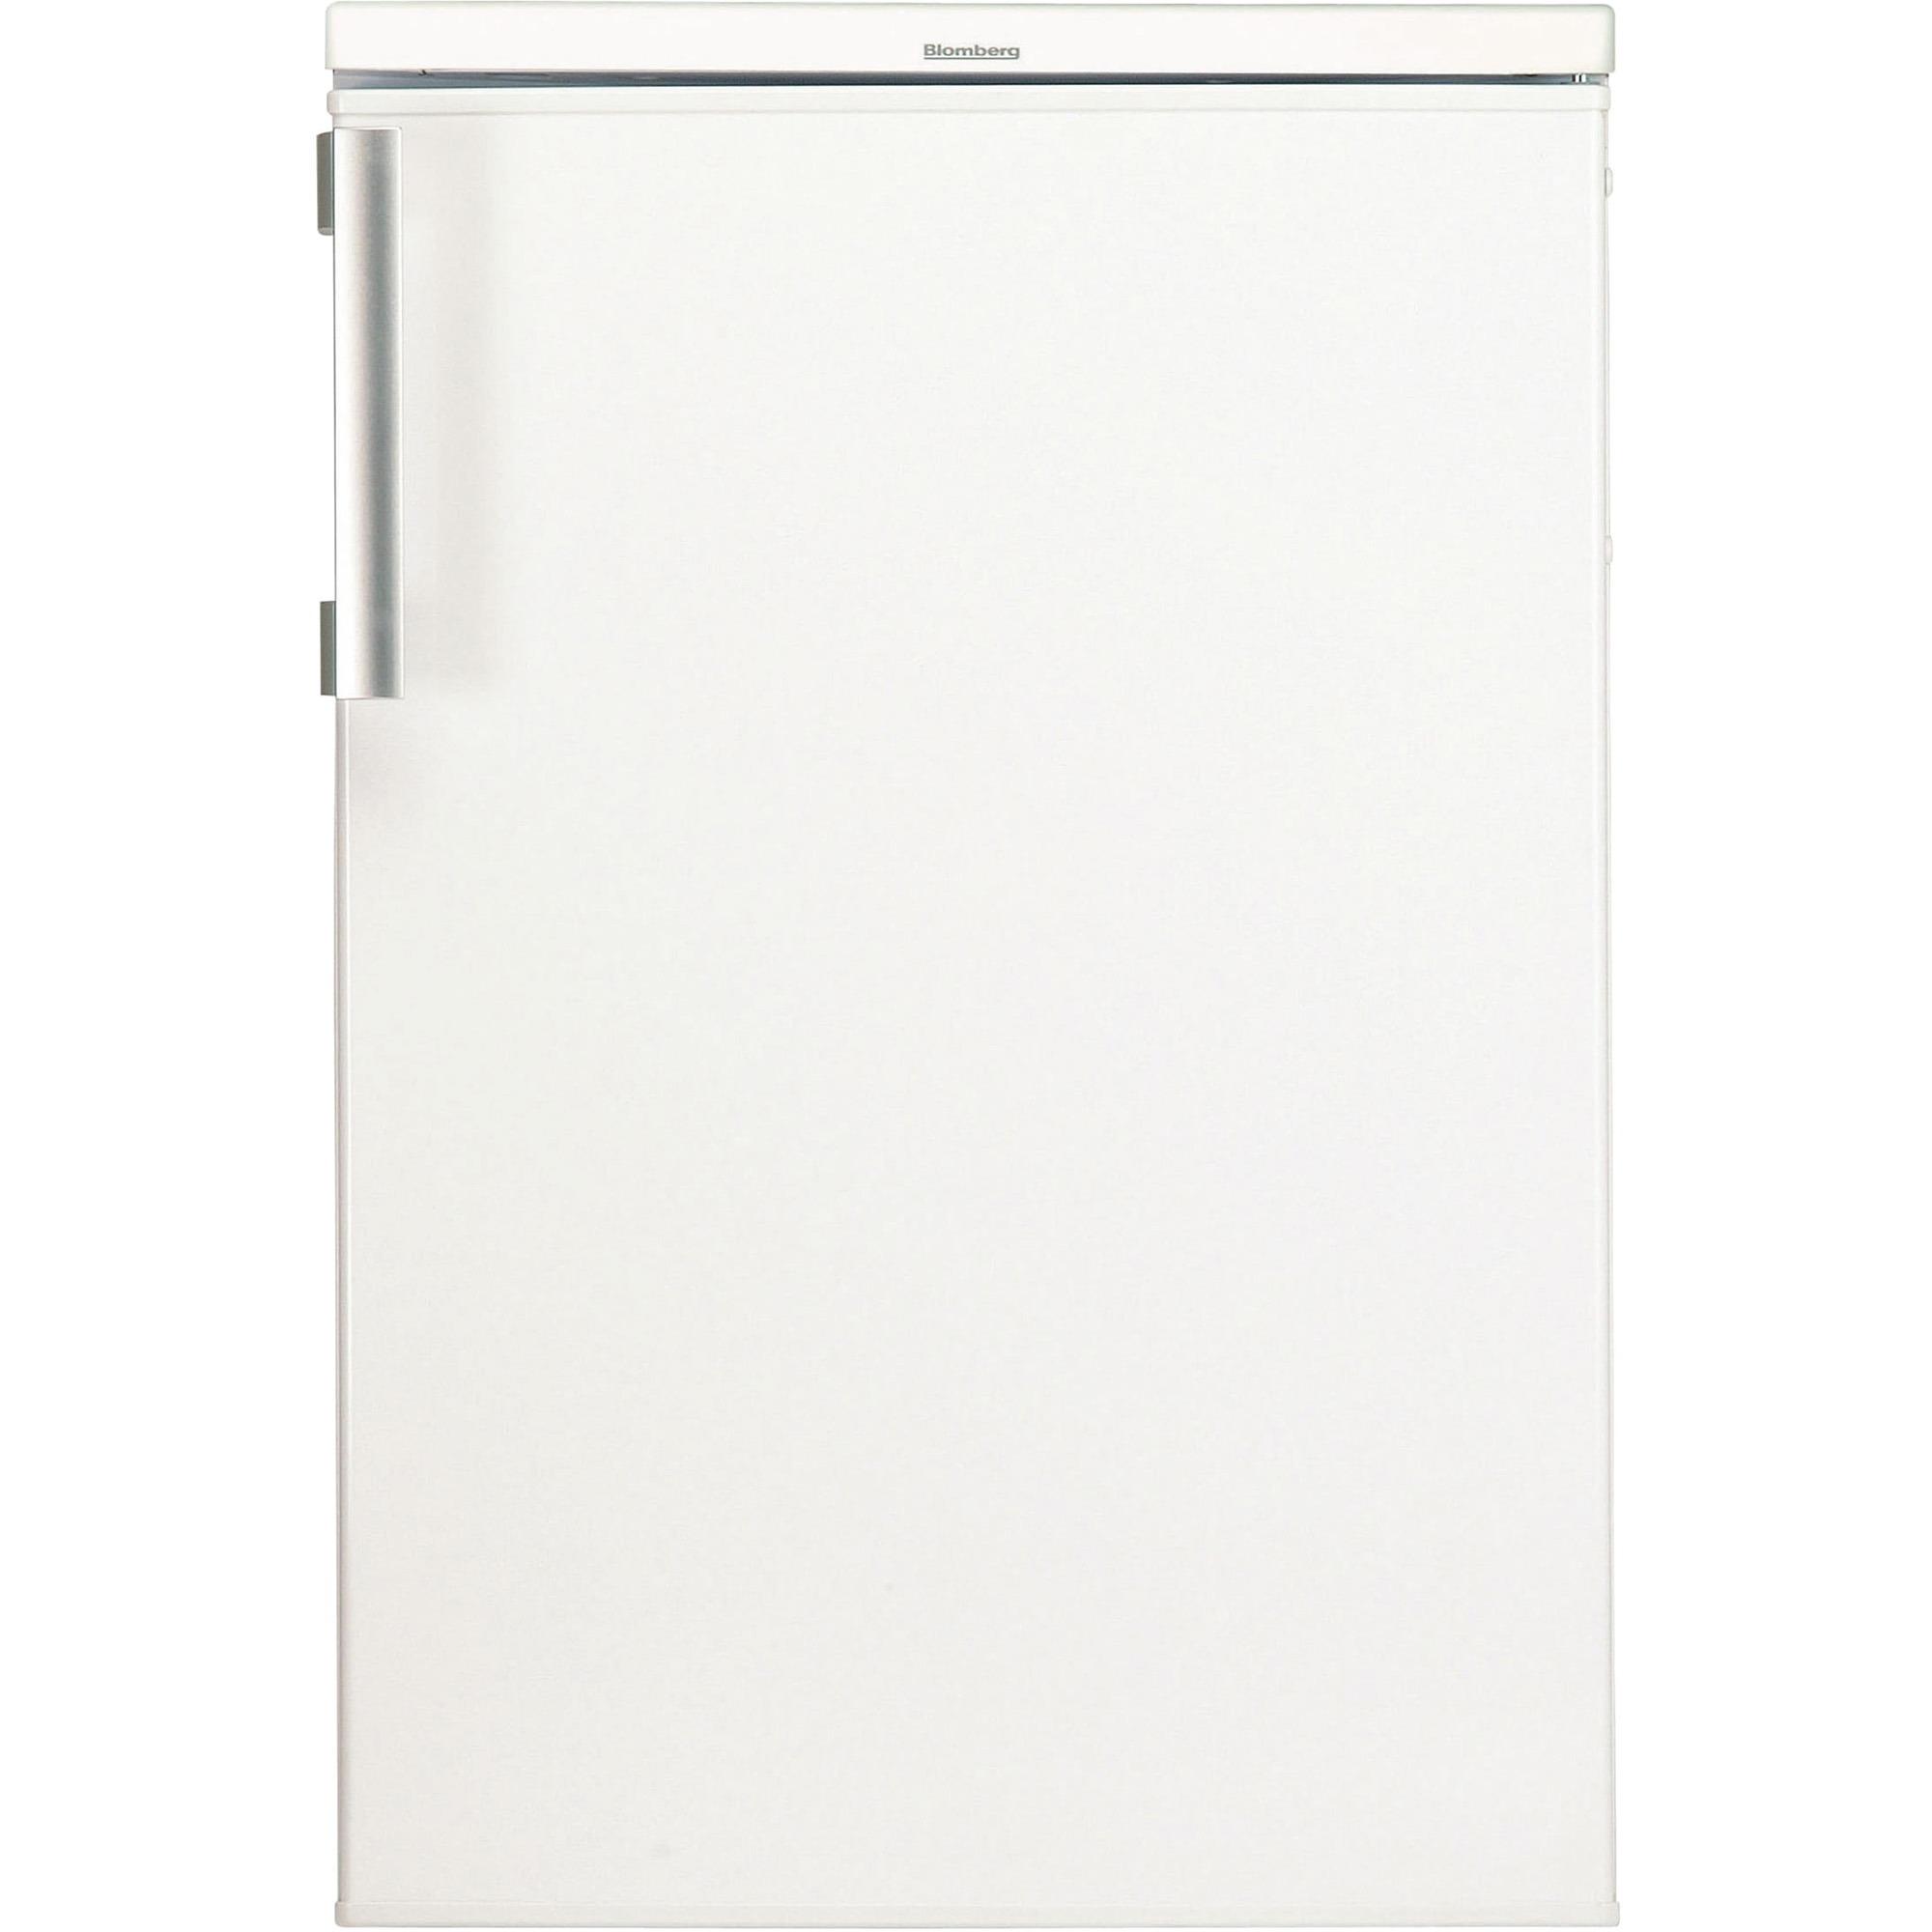 Blomberg Undercounter Freezer - FNE1531P